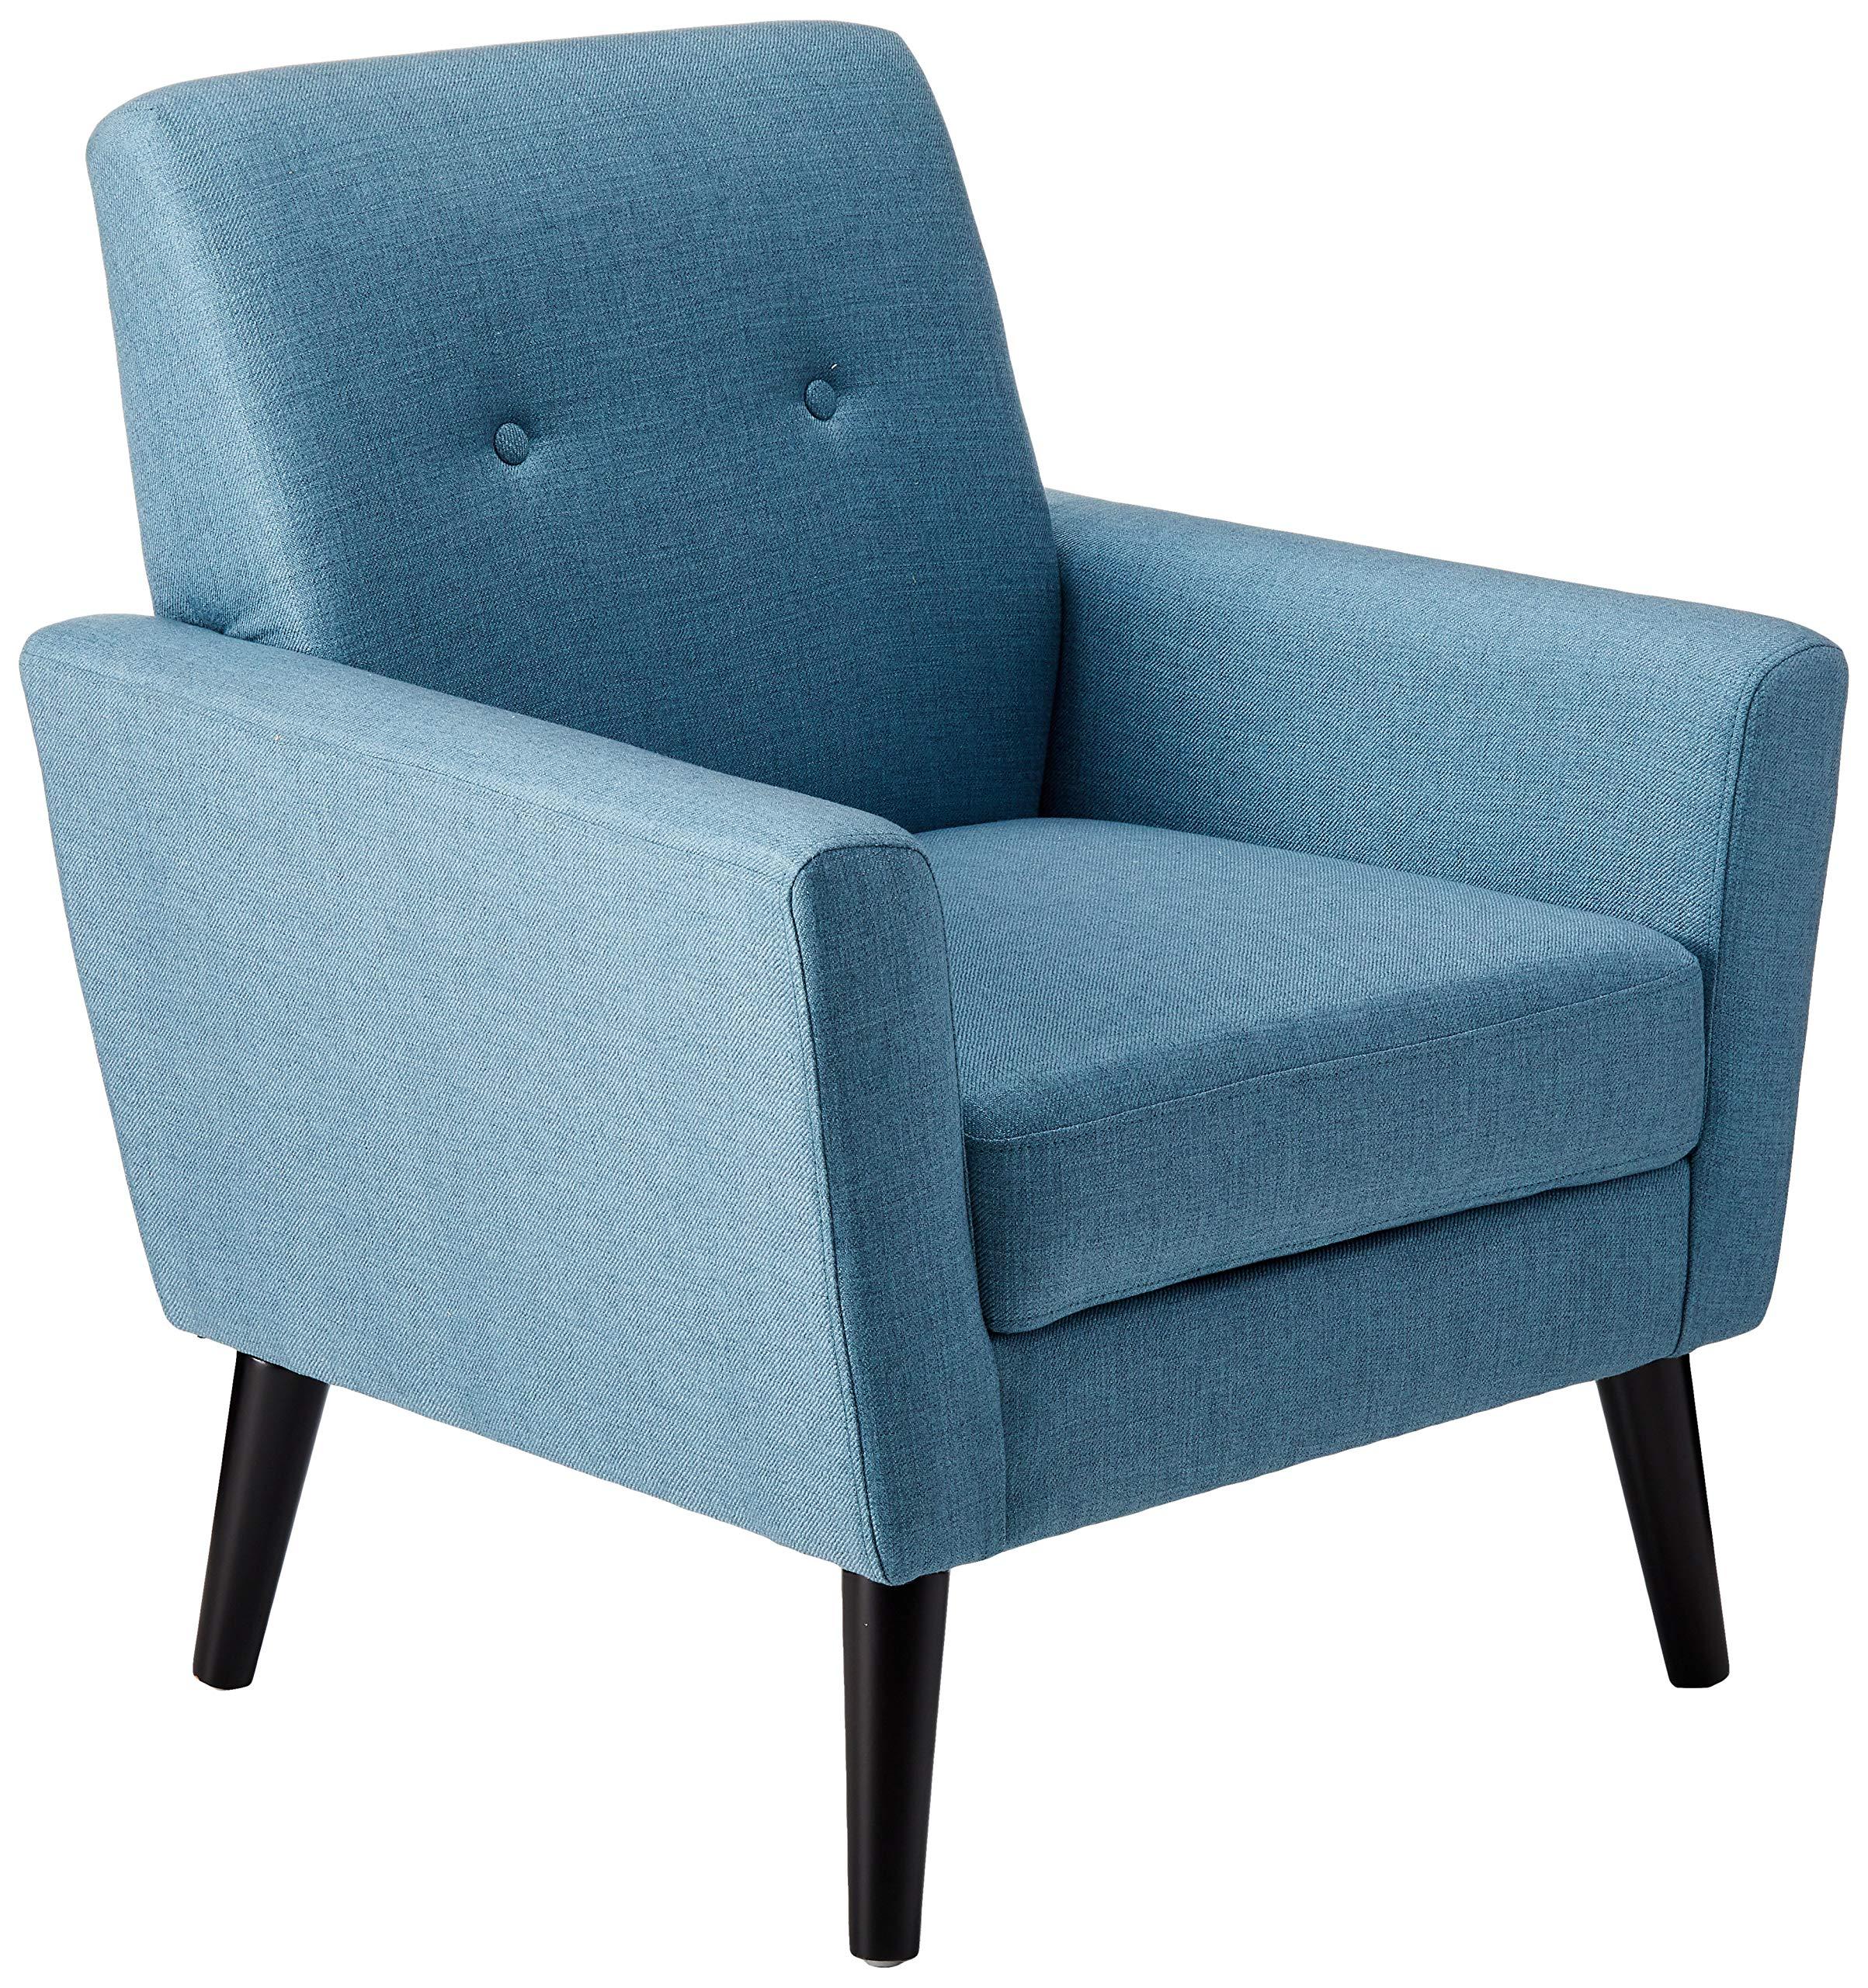 Christopher Knight Home Sierra Mid Century Blue Fabric Club Chair by Christopher Knight Home